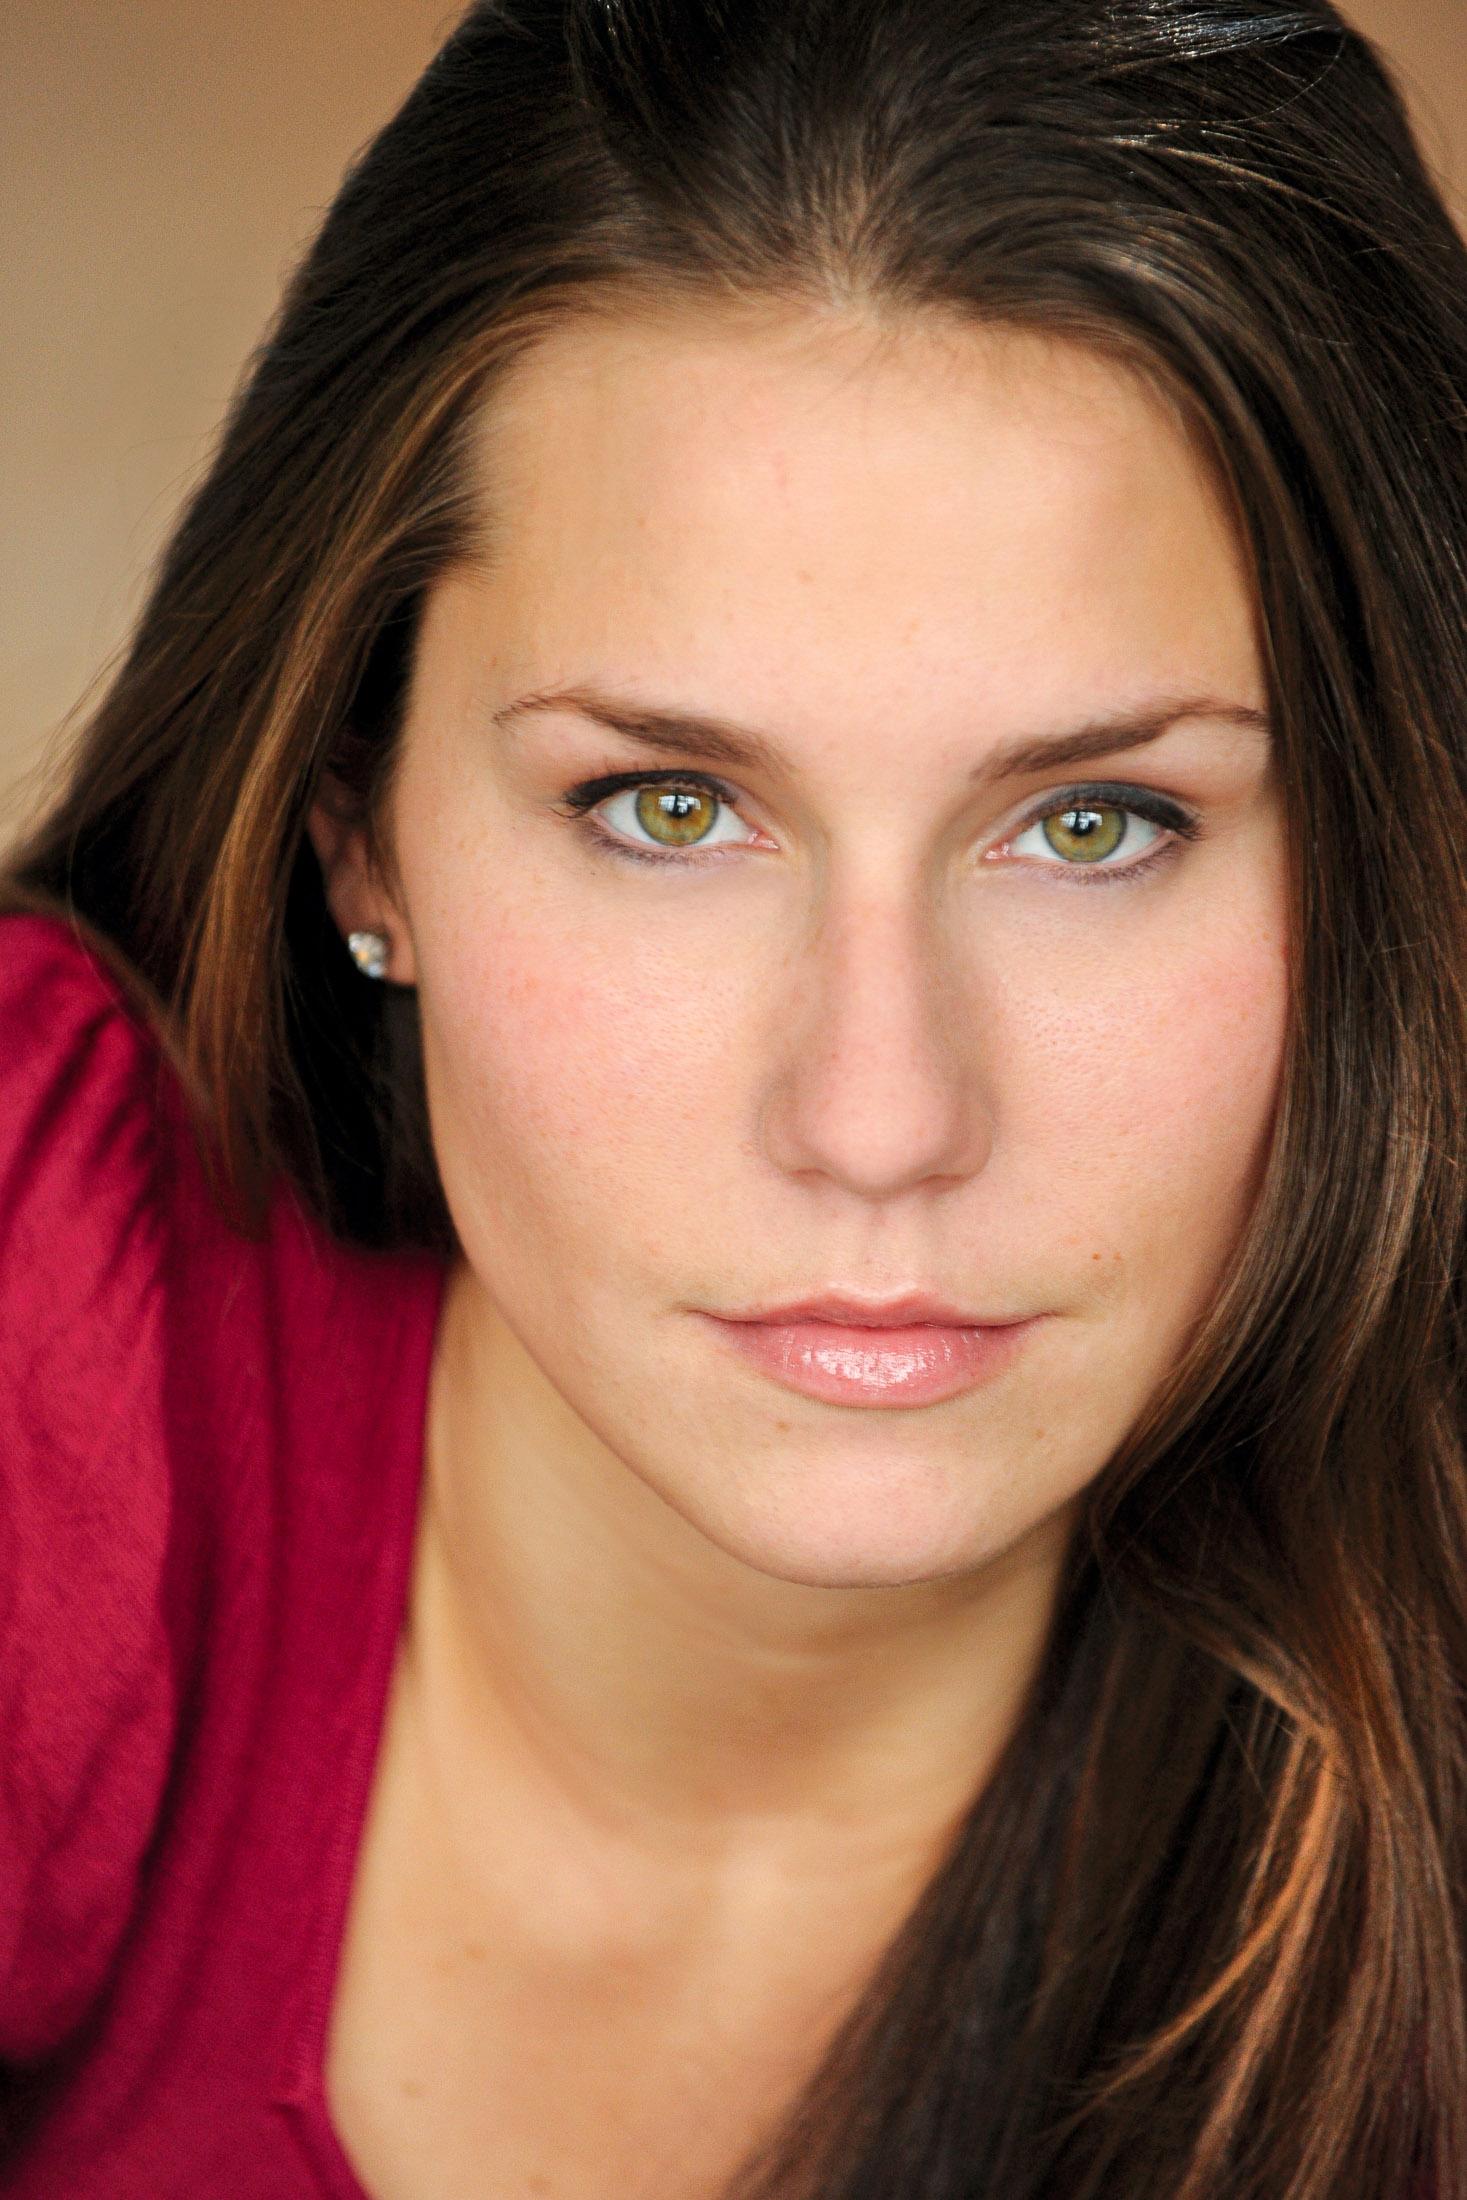 Headshots NYC - Actor Headshots Amy W